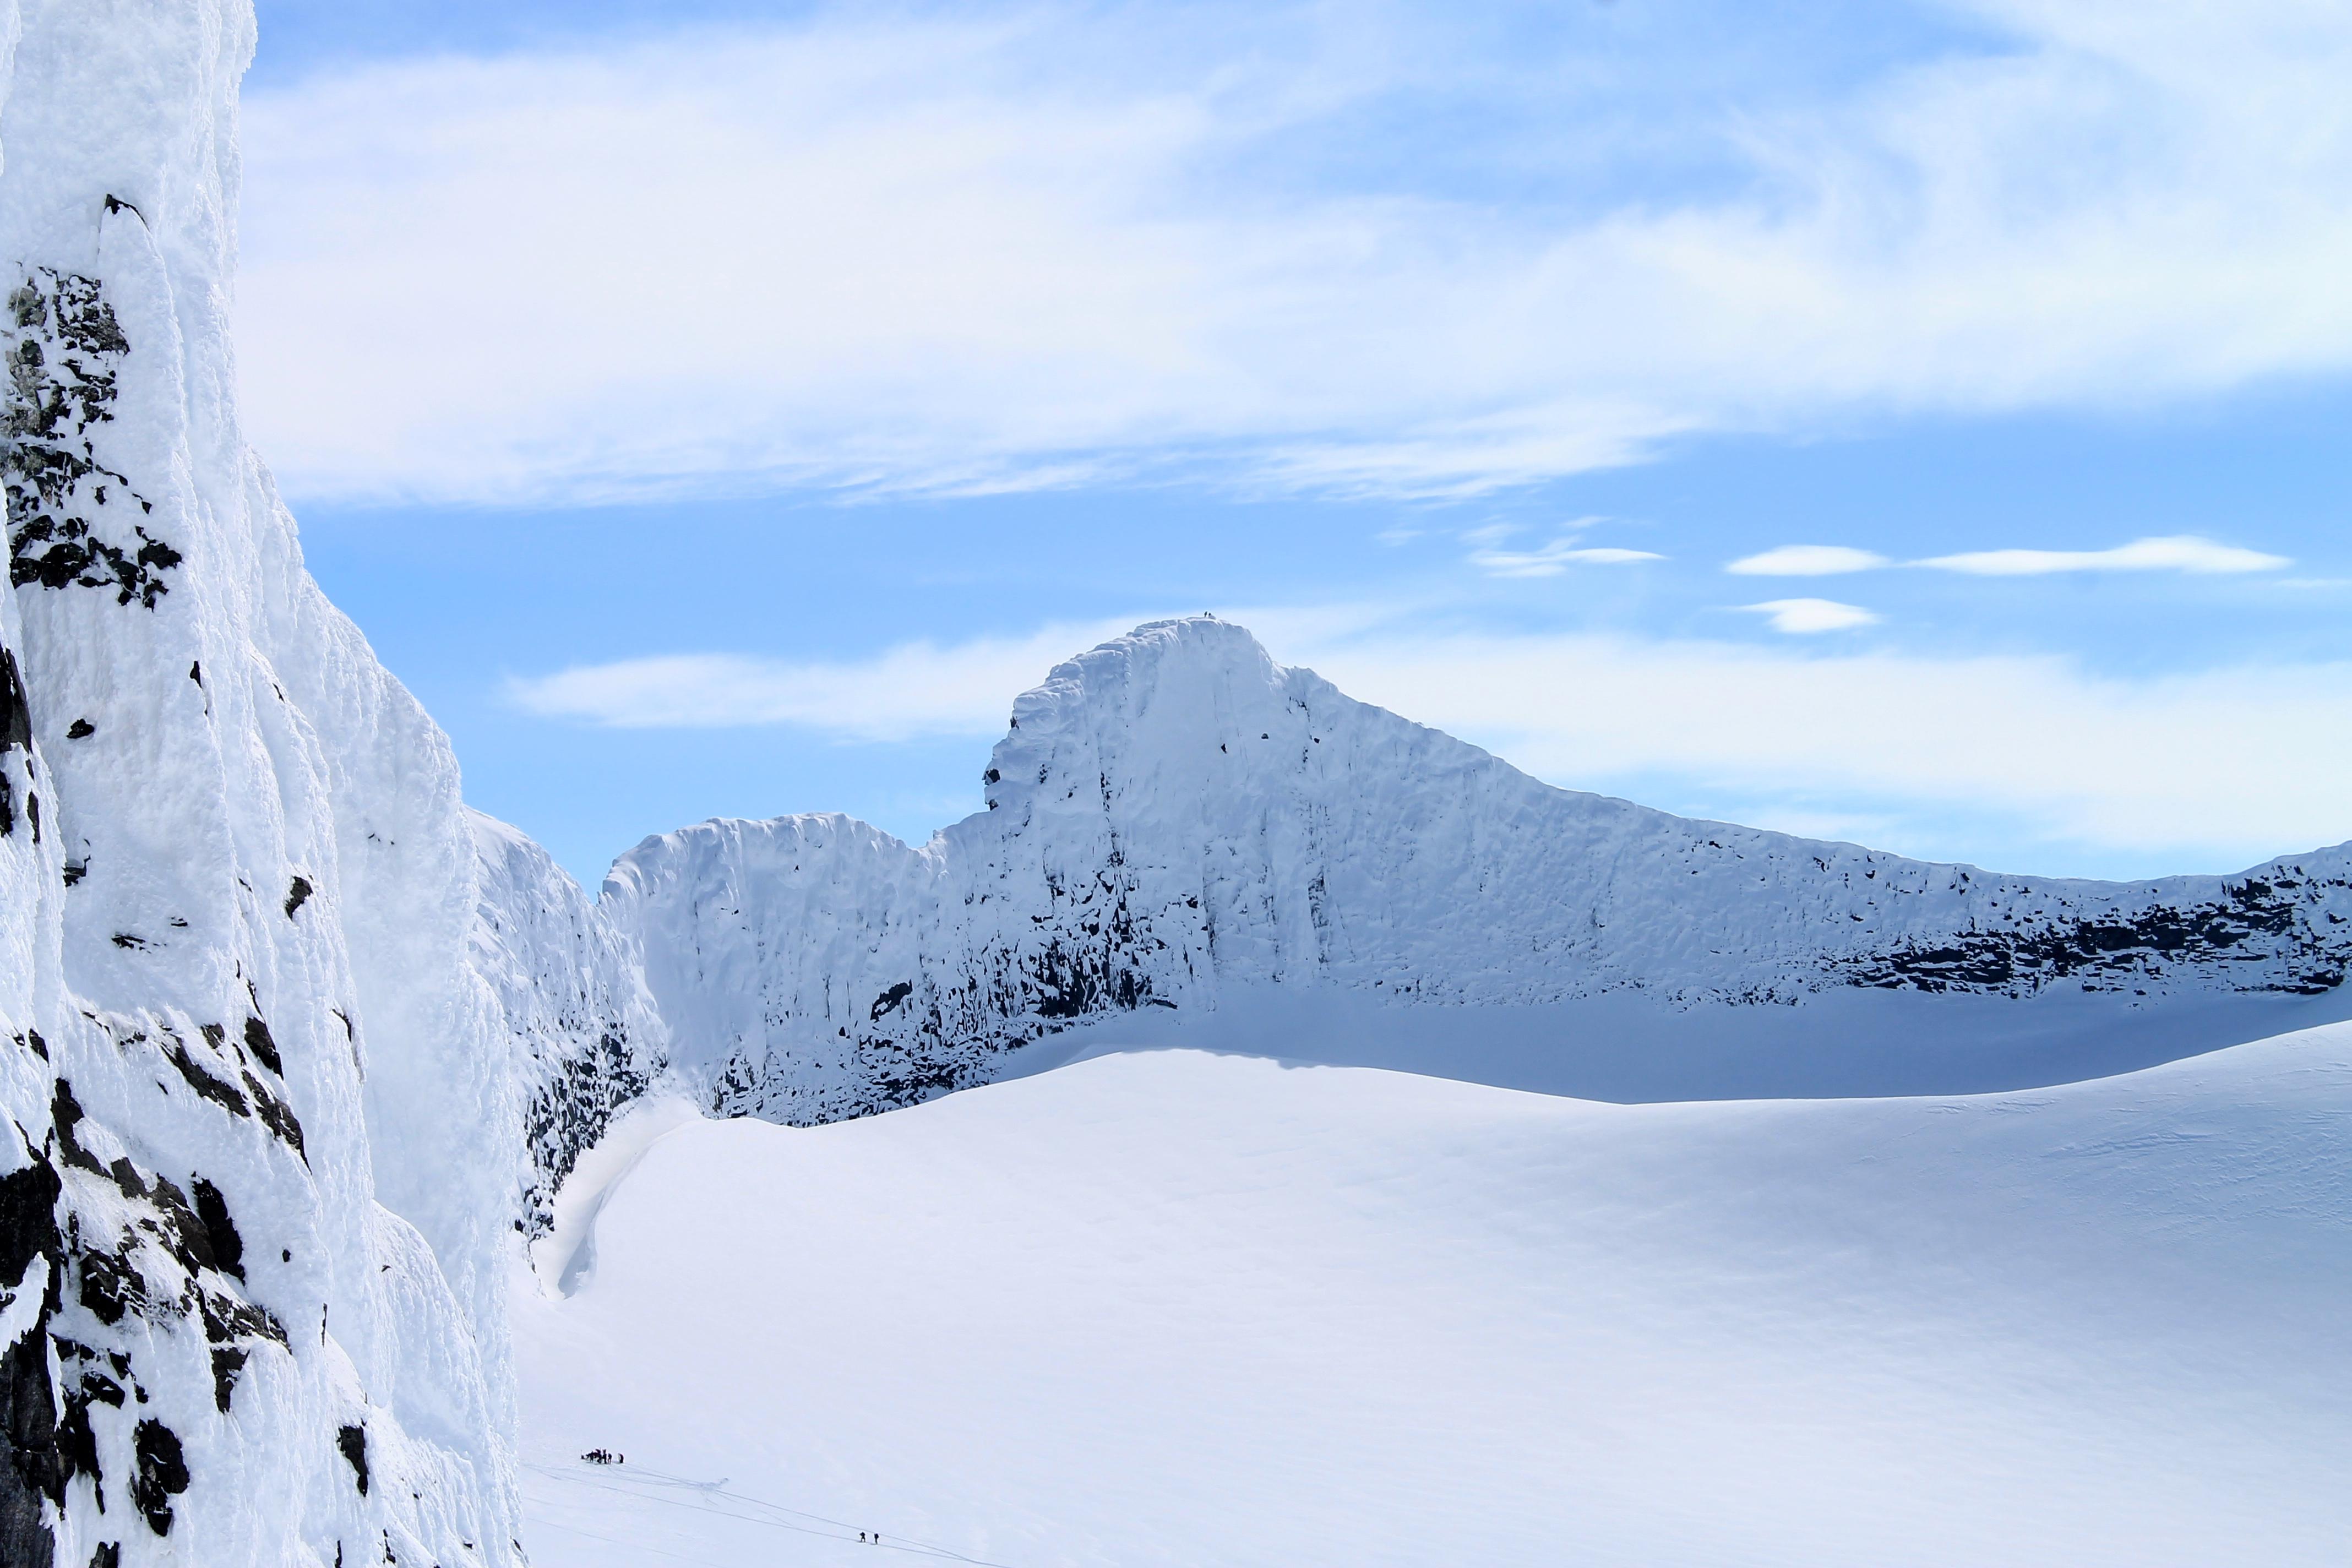 Bjørneryggen i Smørstabbtindmassivet, Jotunheimen.